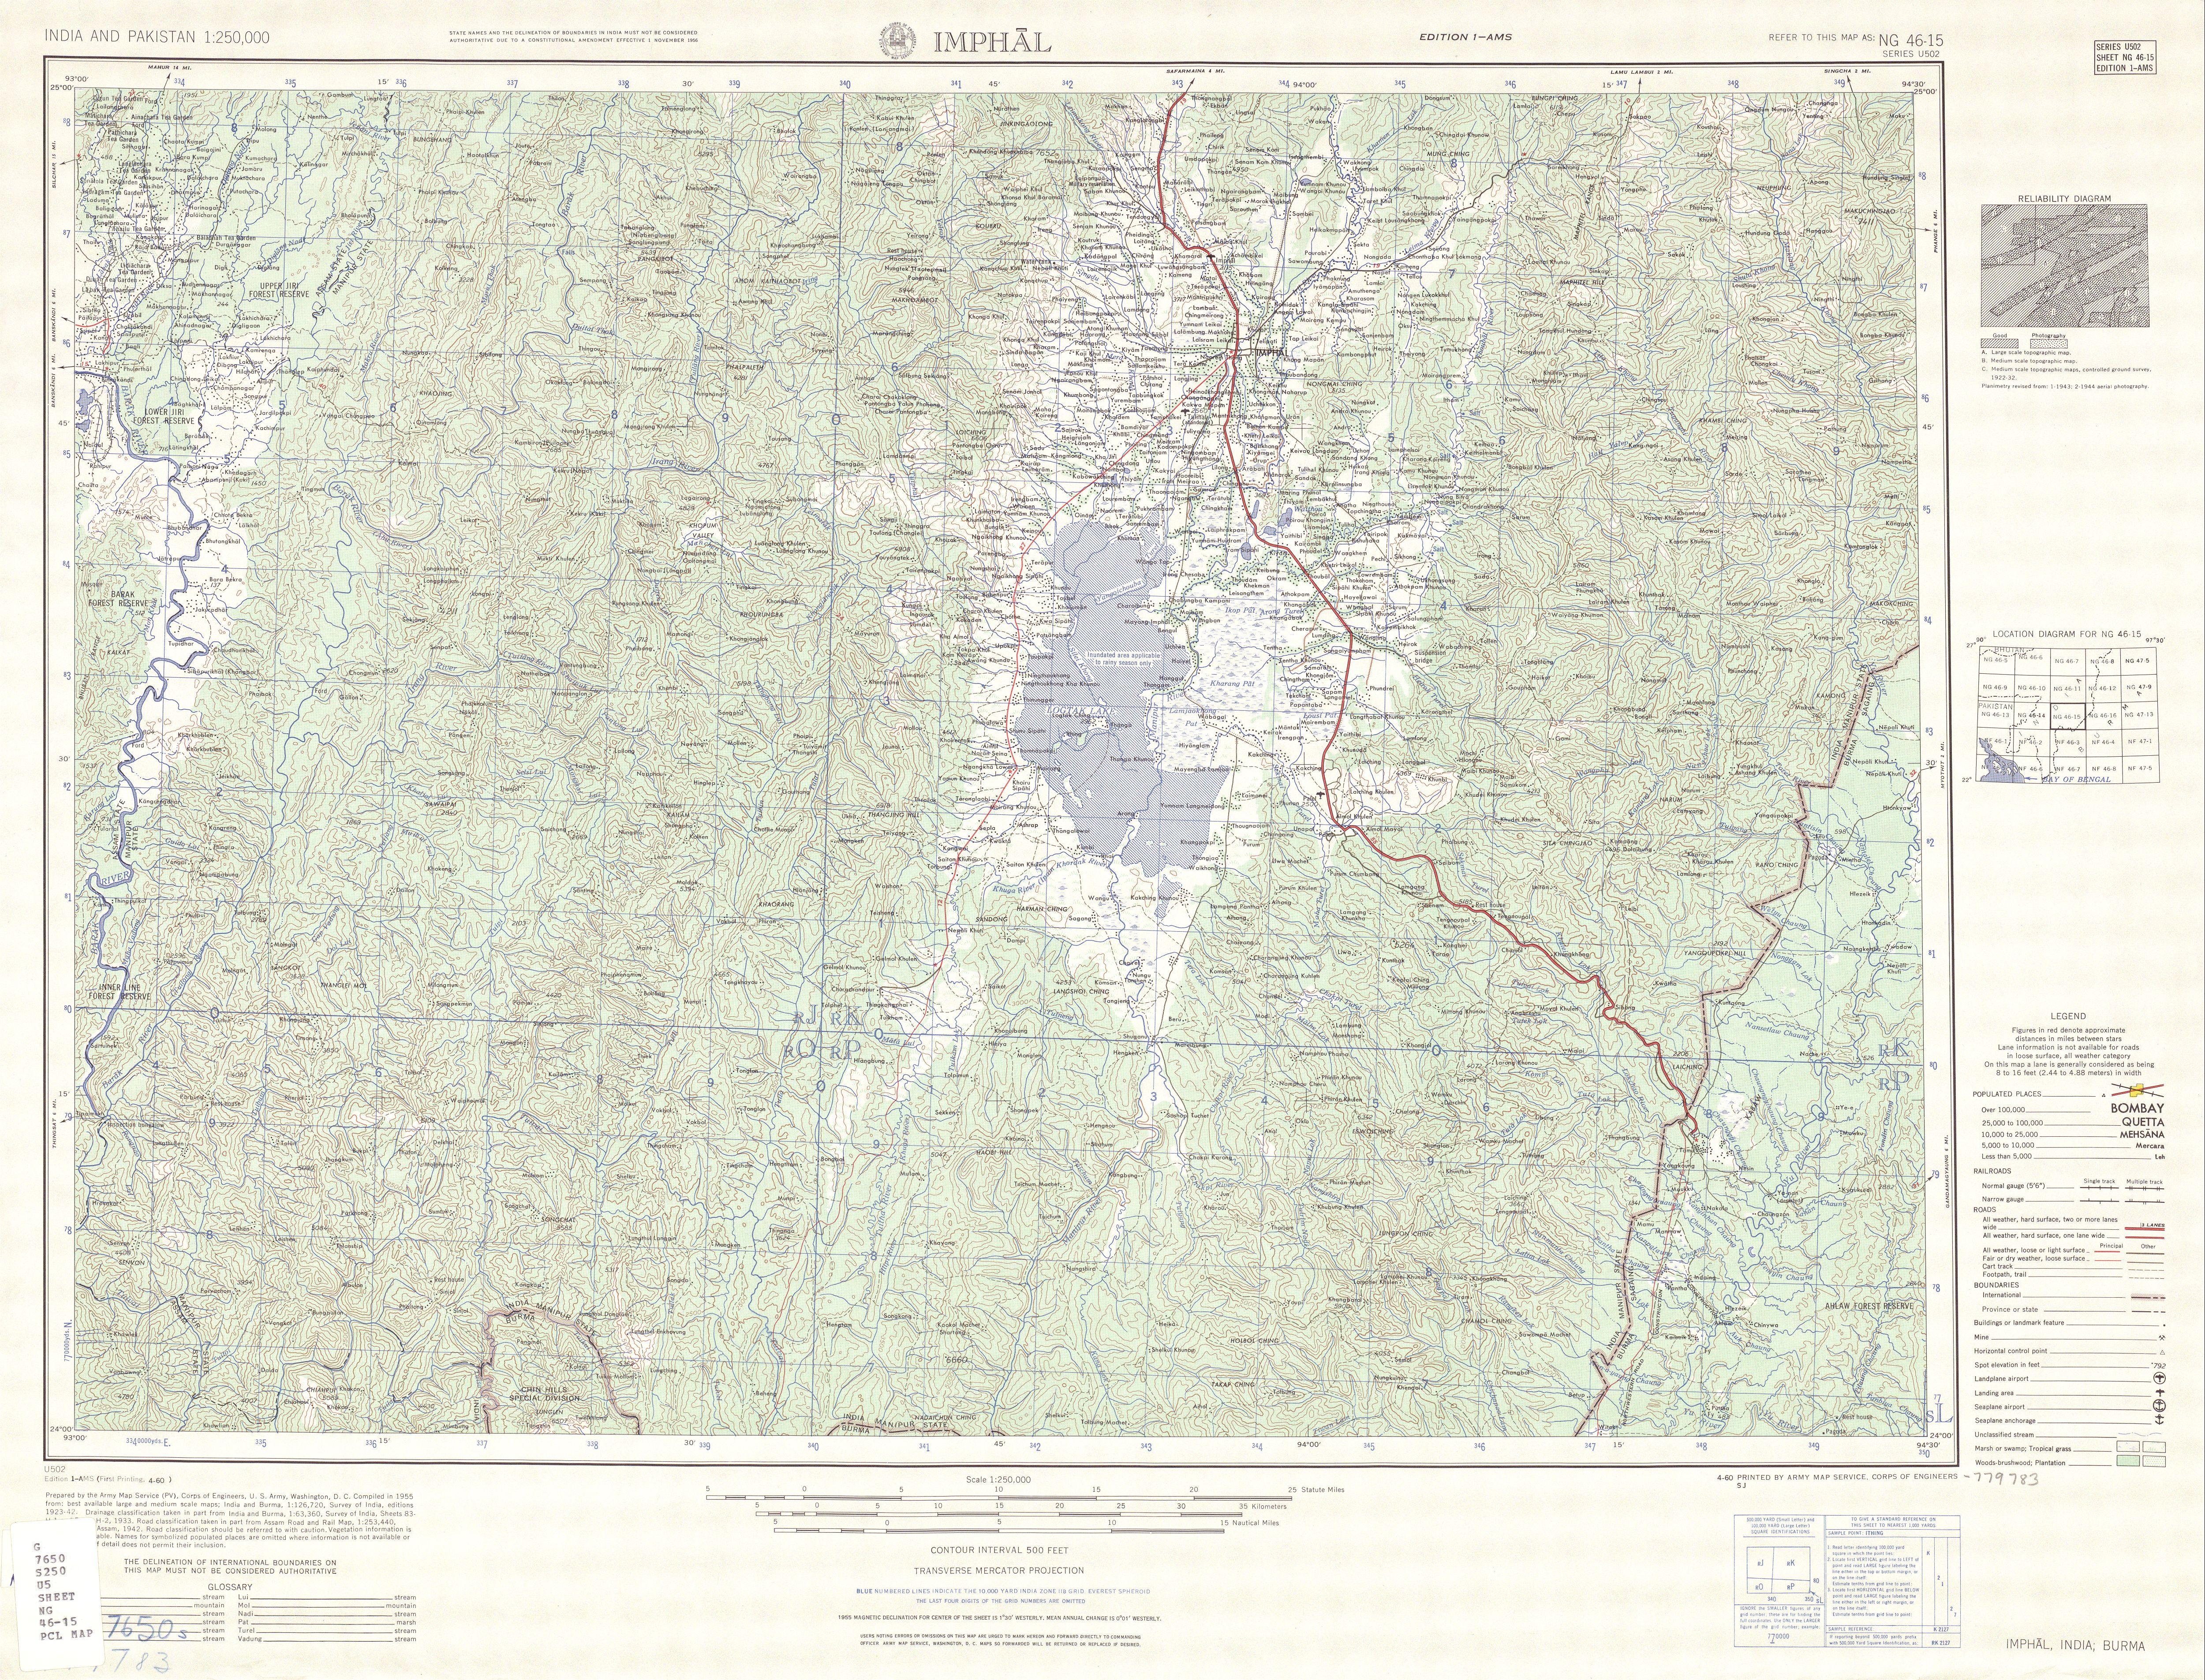 File Map India And Pakistan 1 250 000 Tile Ng 46 15 Imphal Jpg